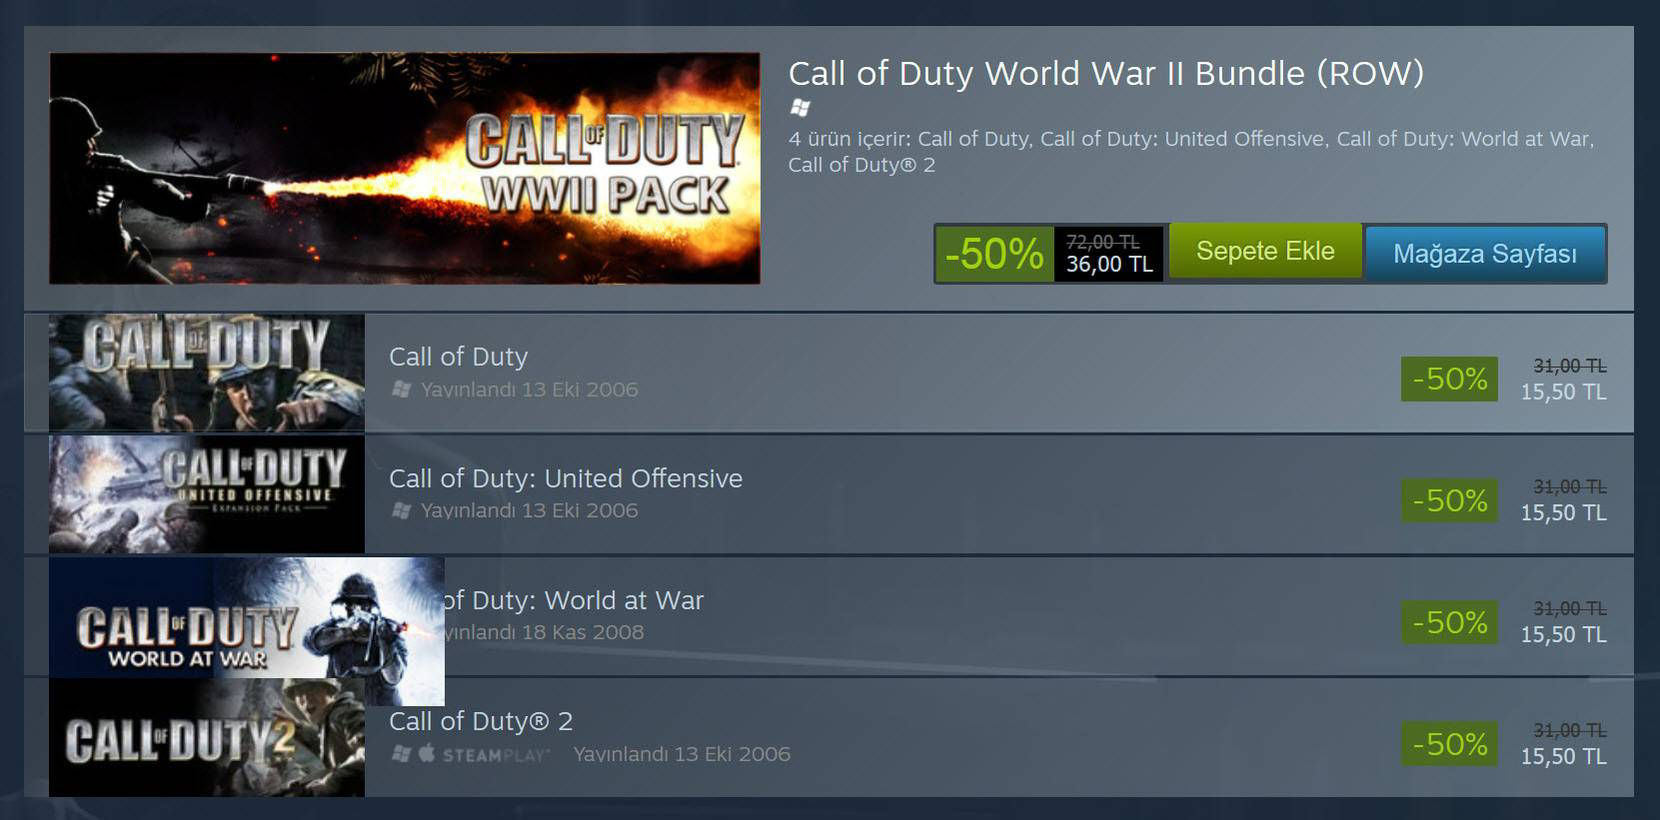 Call of Duty İndirim Kampanyası